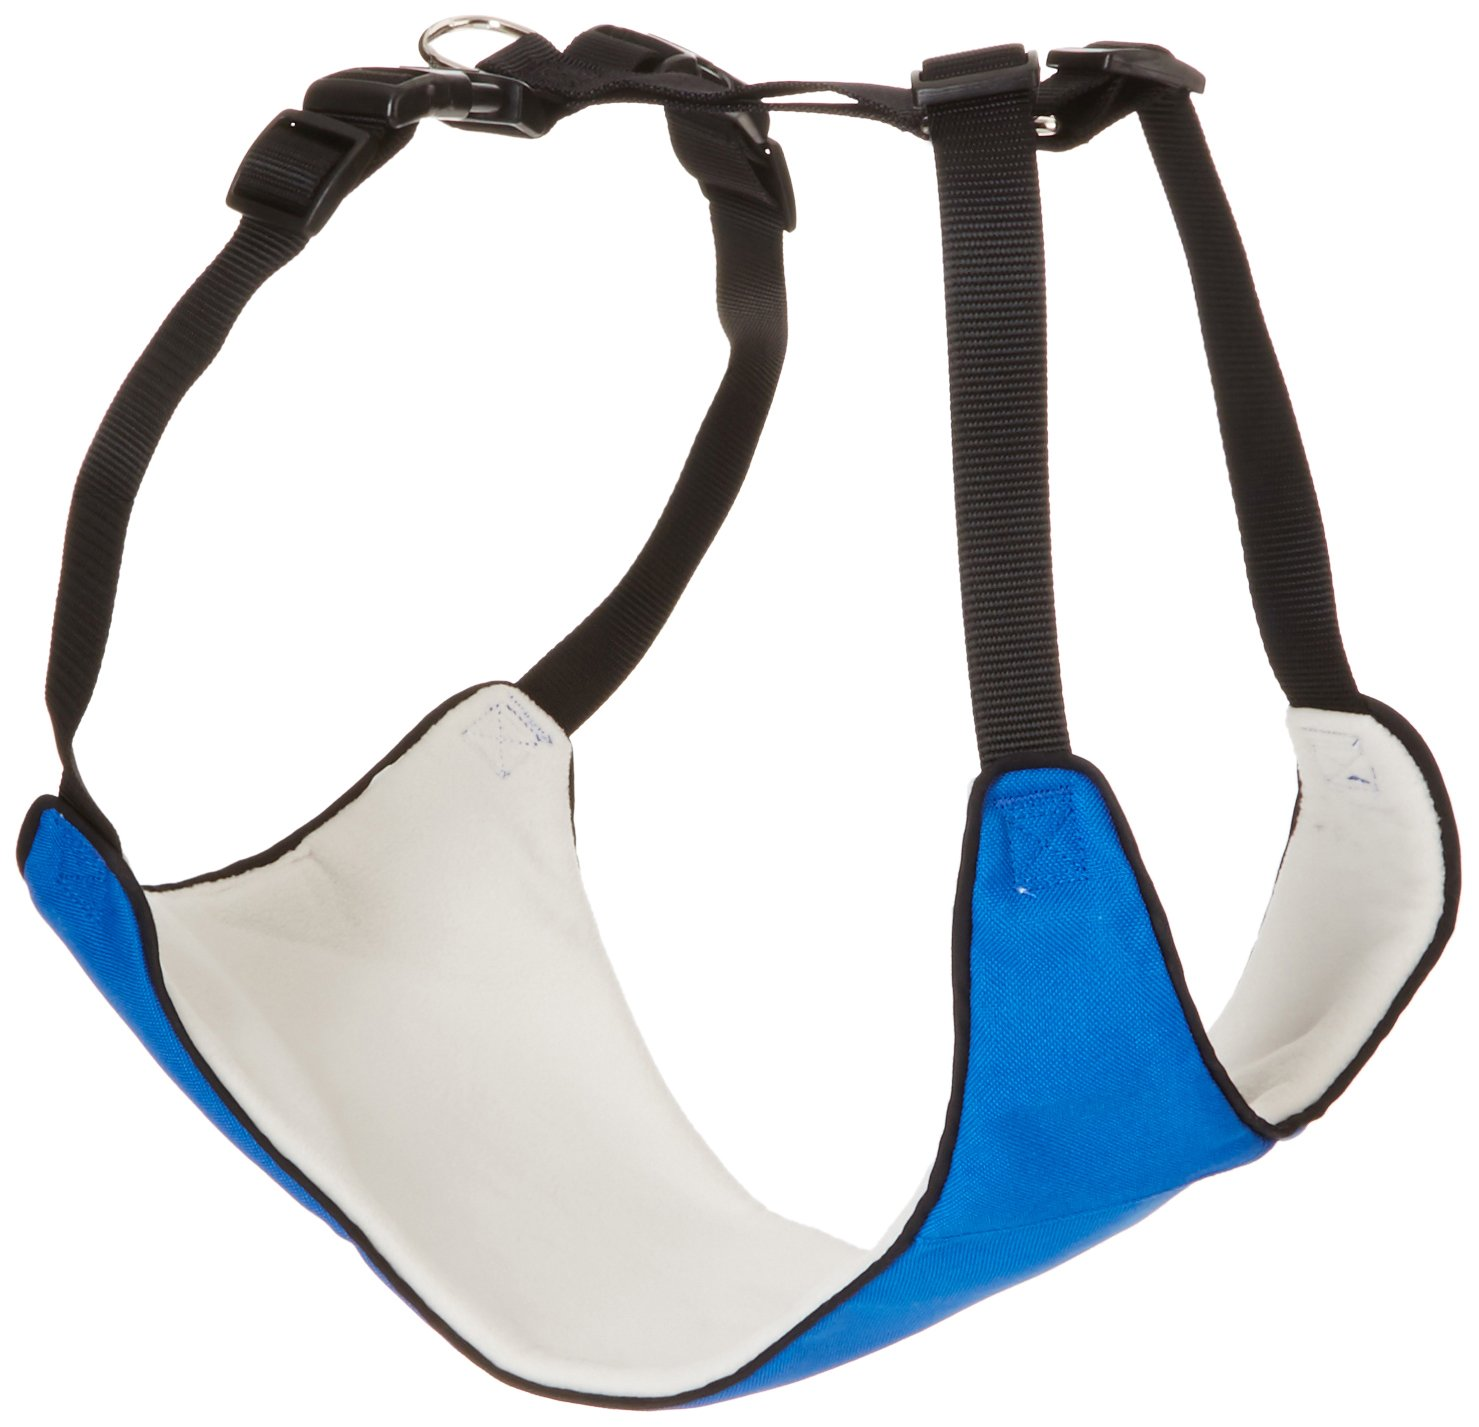 Guardian Gear Nylon Lift & Lead 4-in-1 Dog Harness, X-Large, Blue